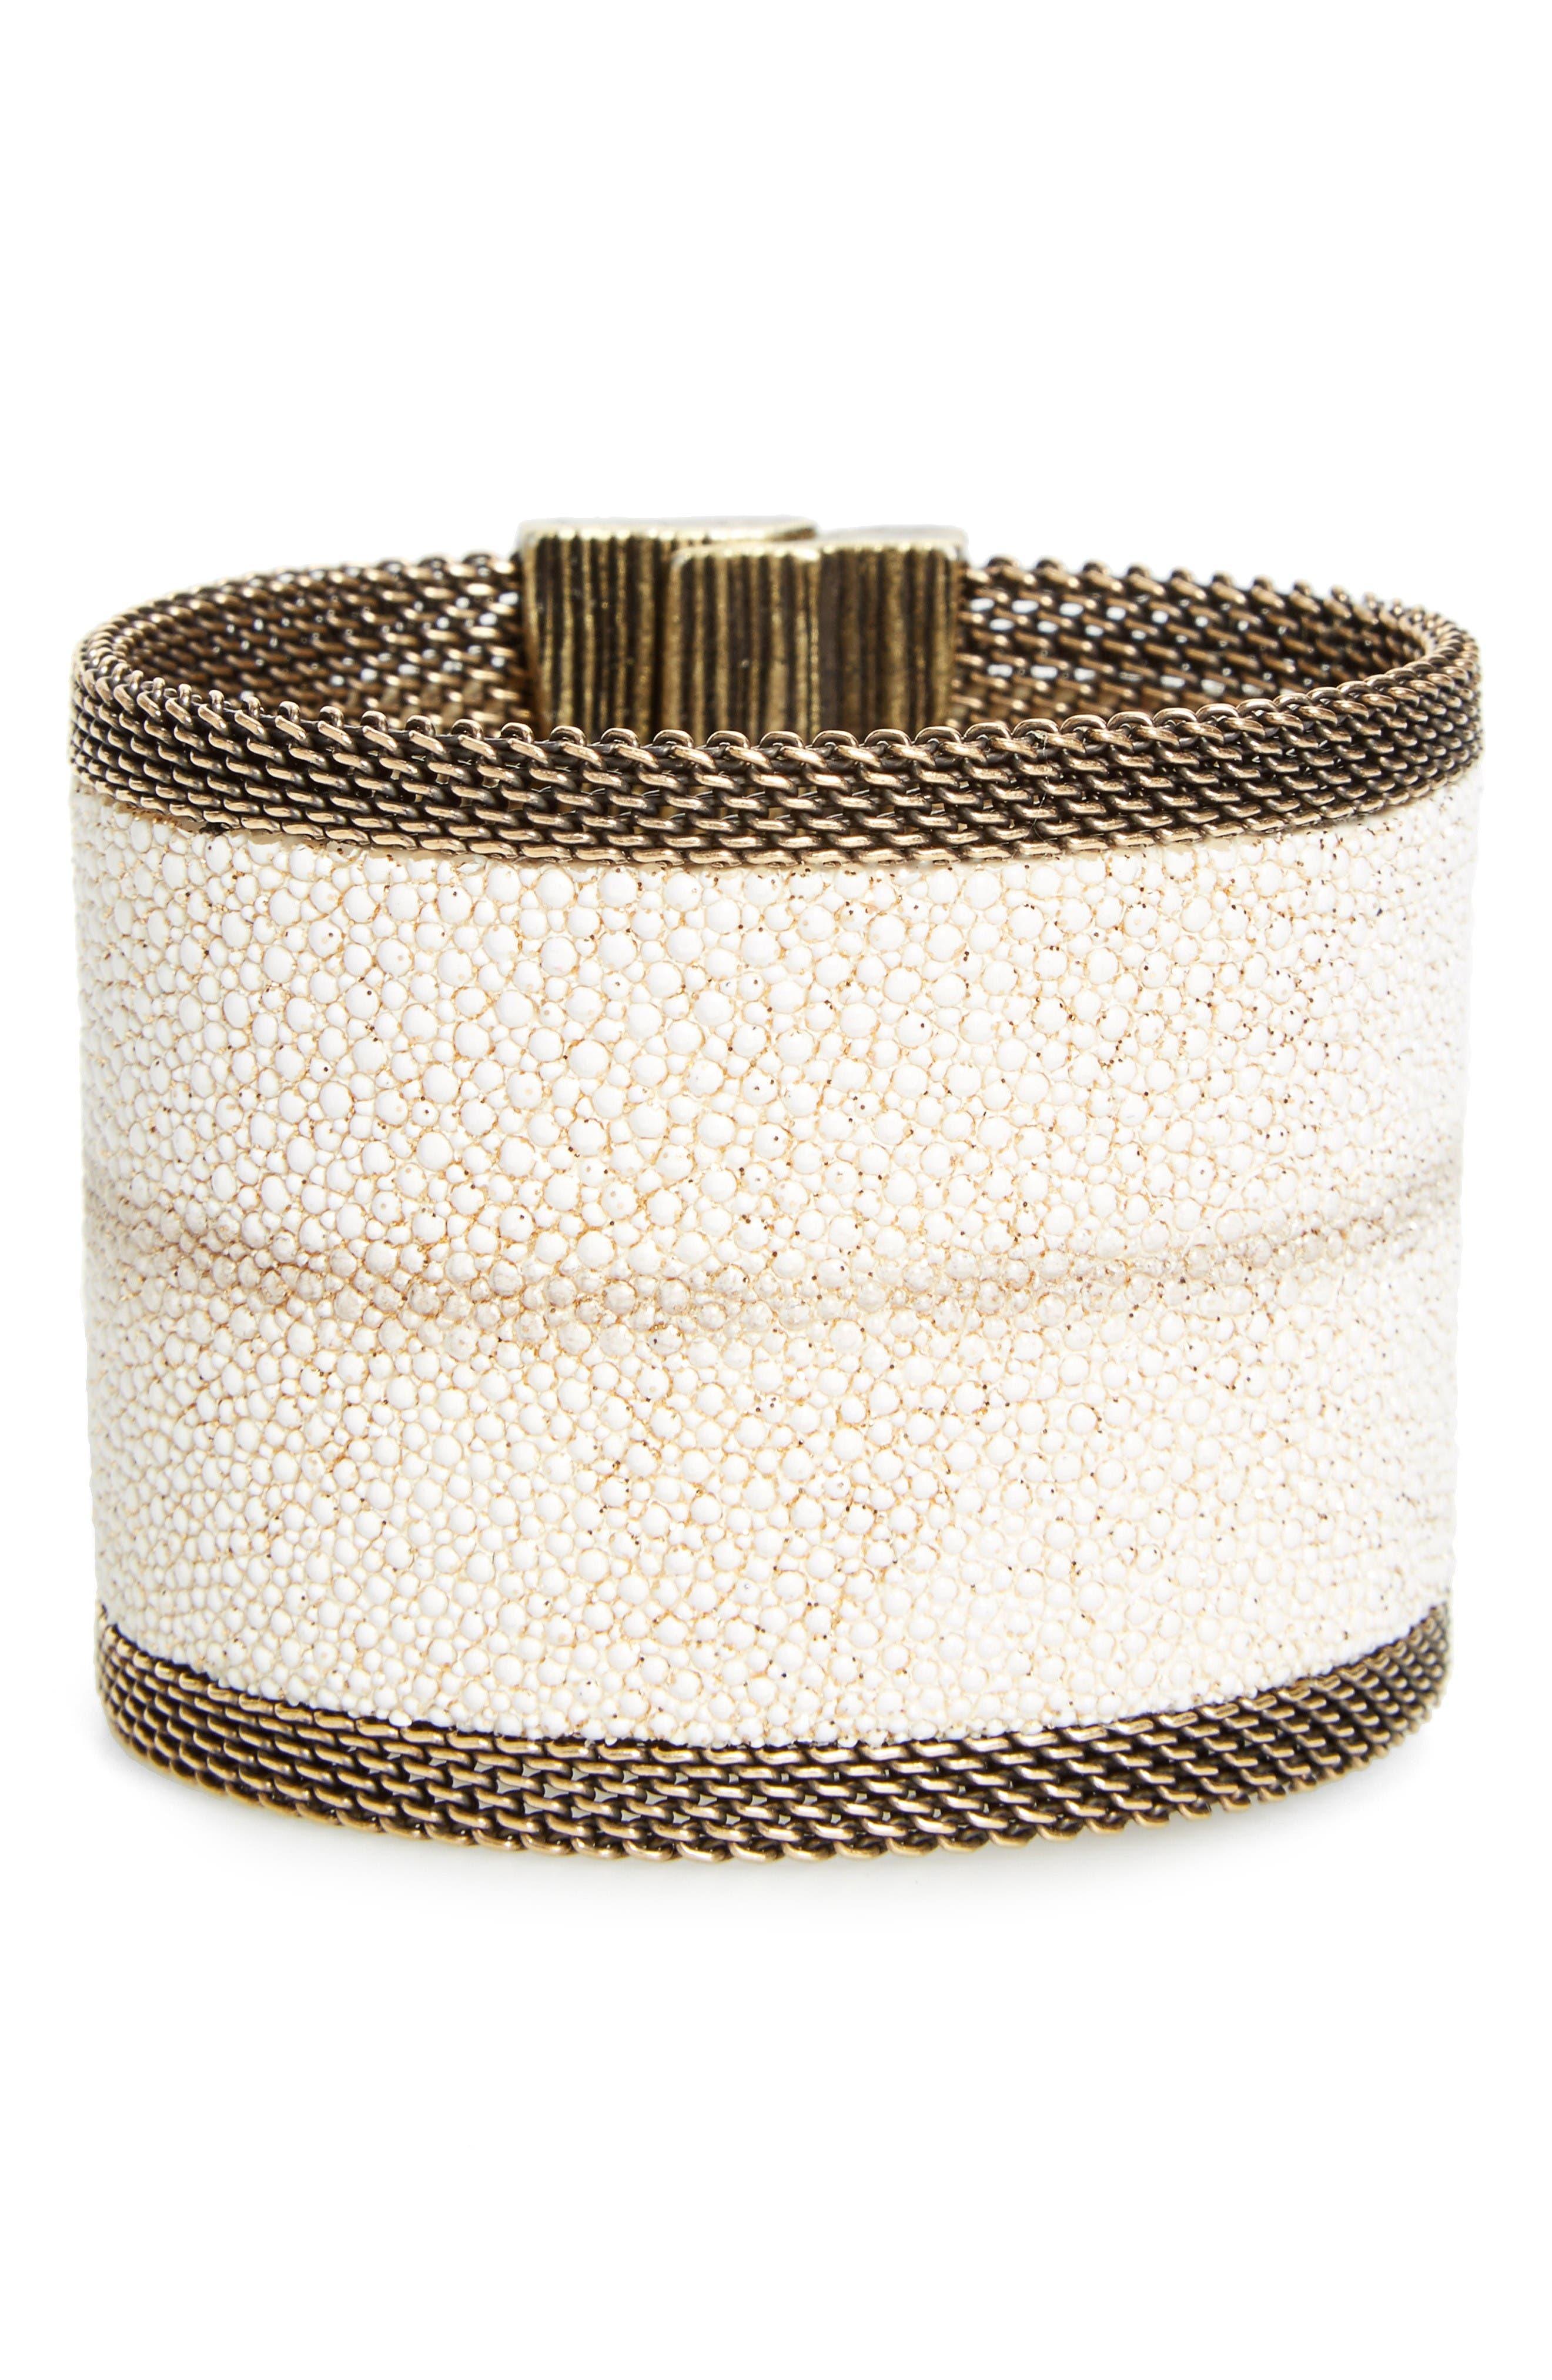 Alternate Image 1 Selected - Cynthia Desser Genuine Stingray Skin Bracelet